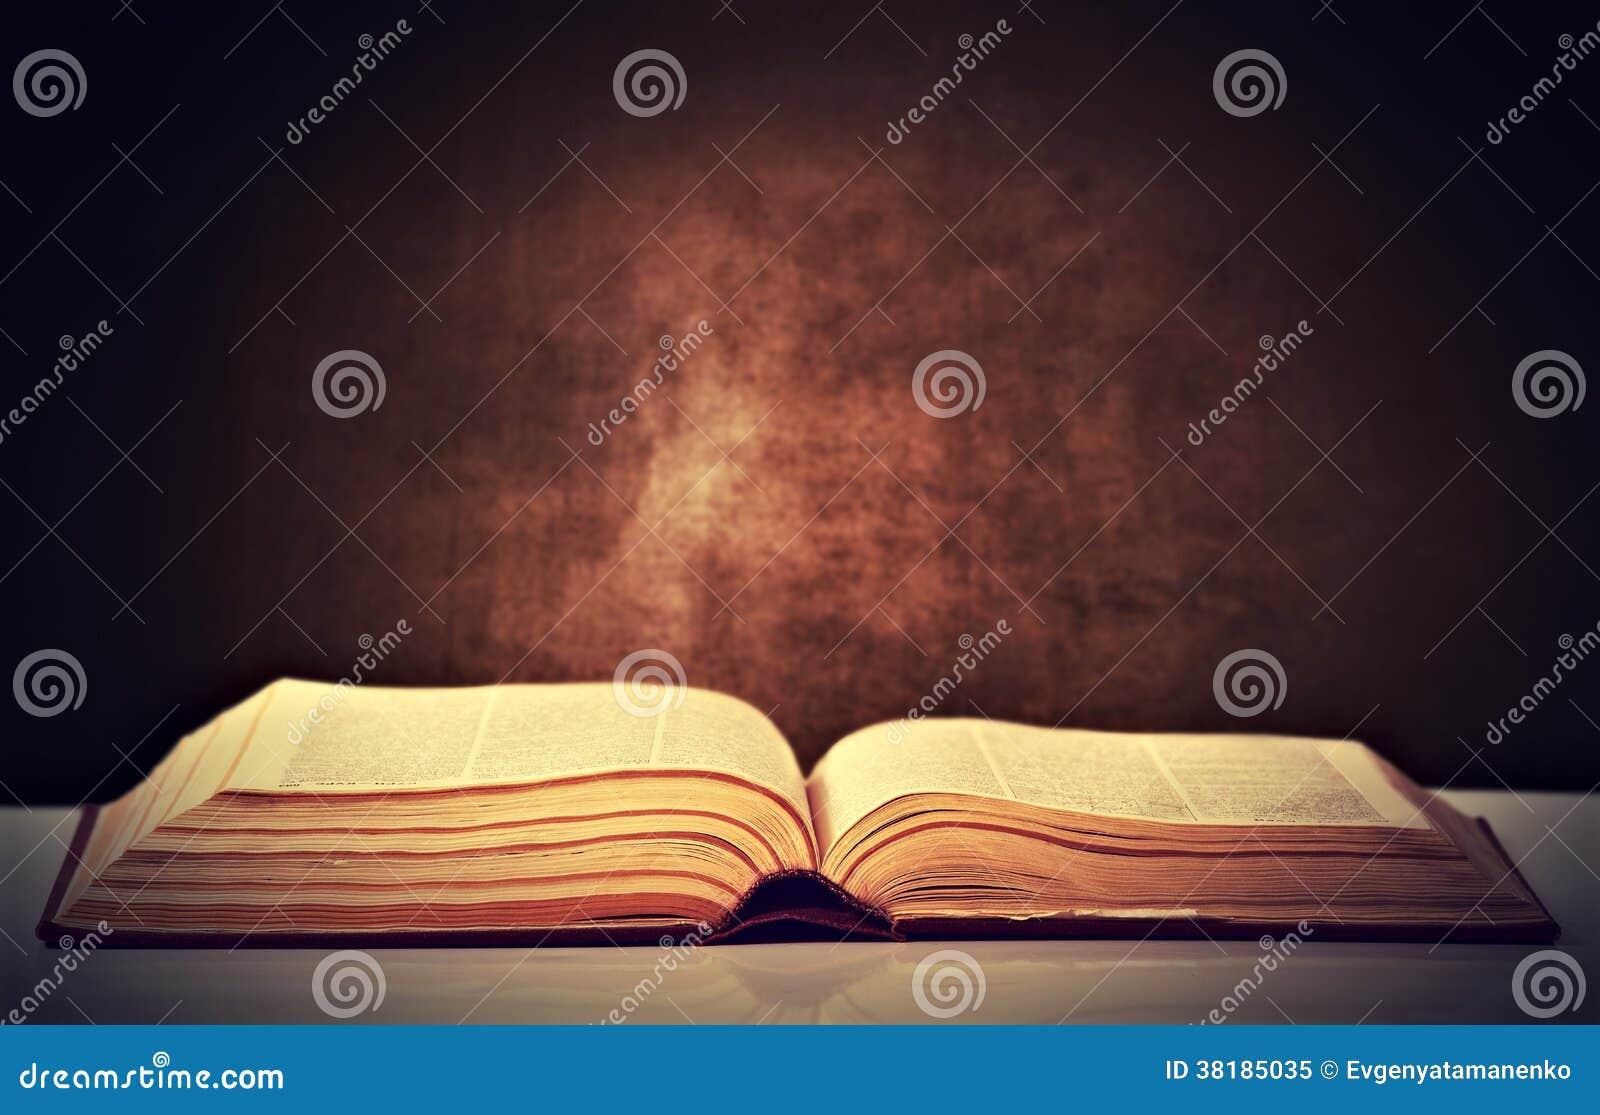 Livro marrom velho aberto